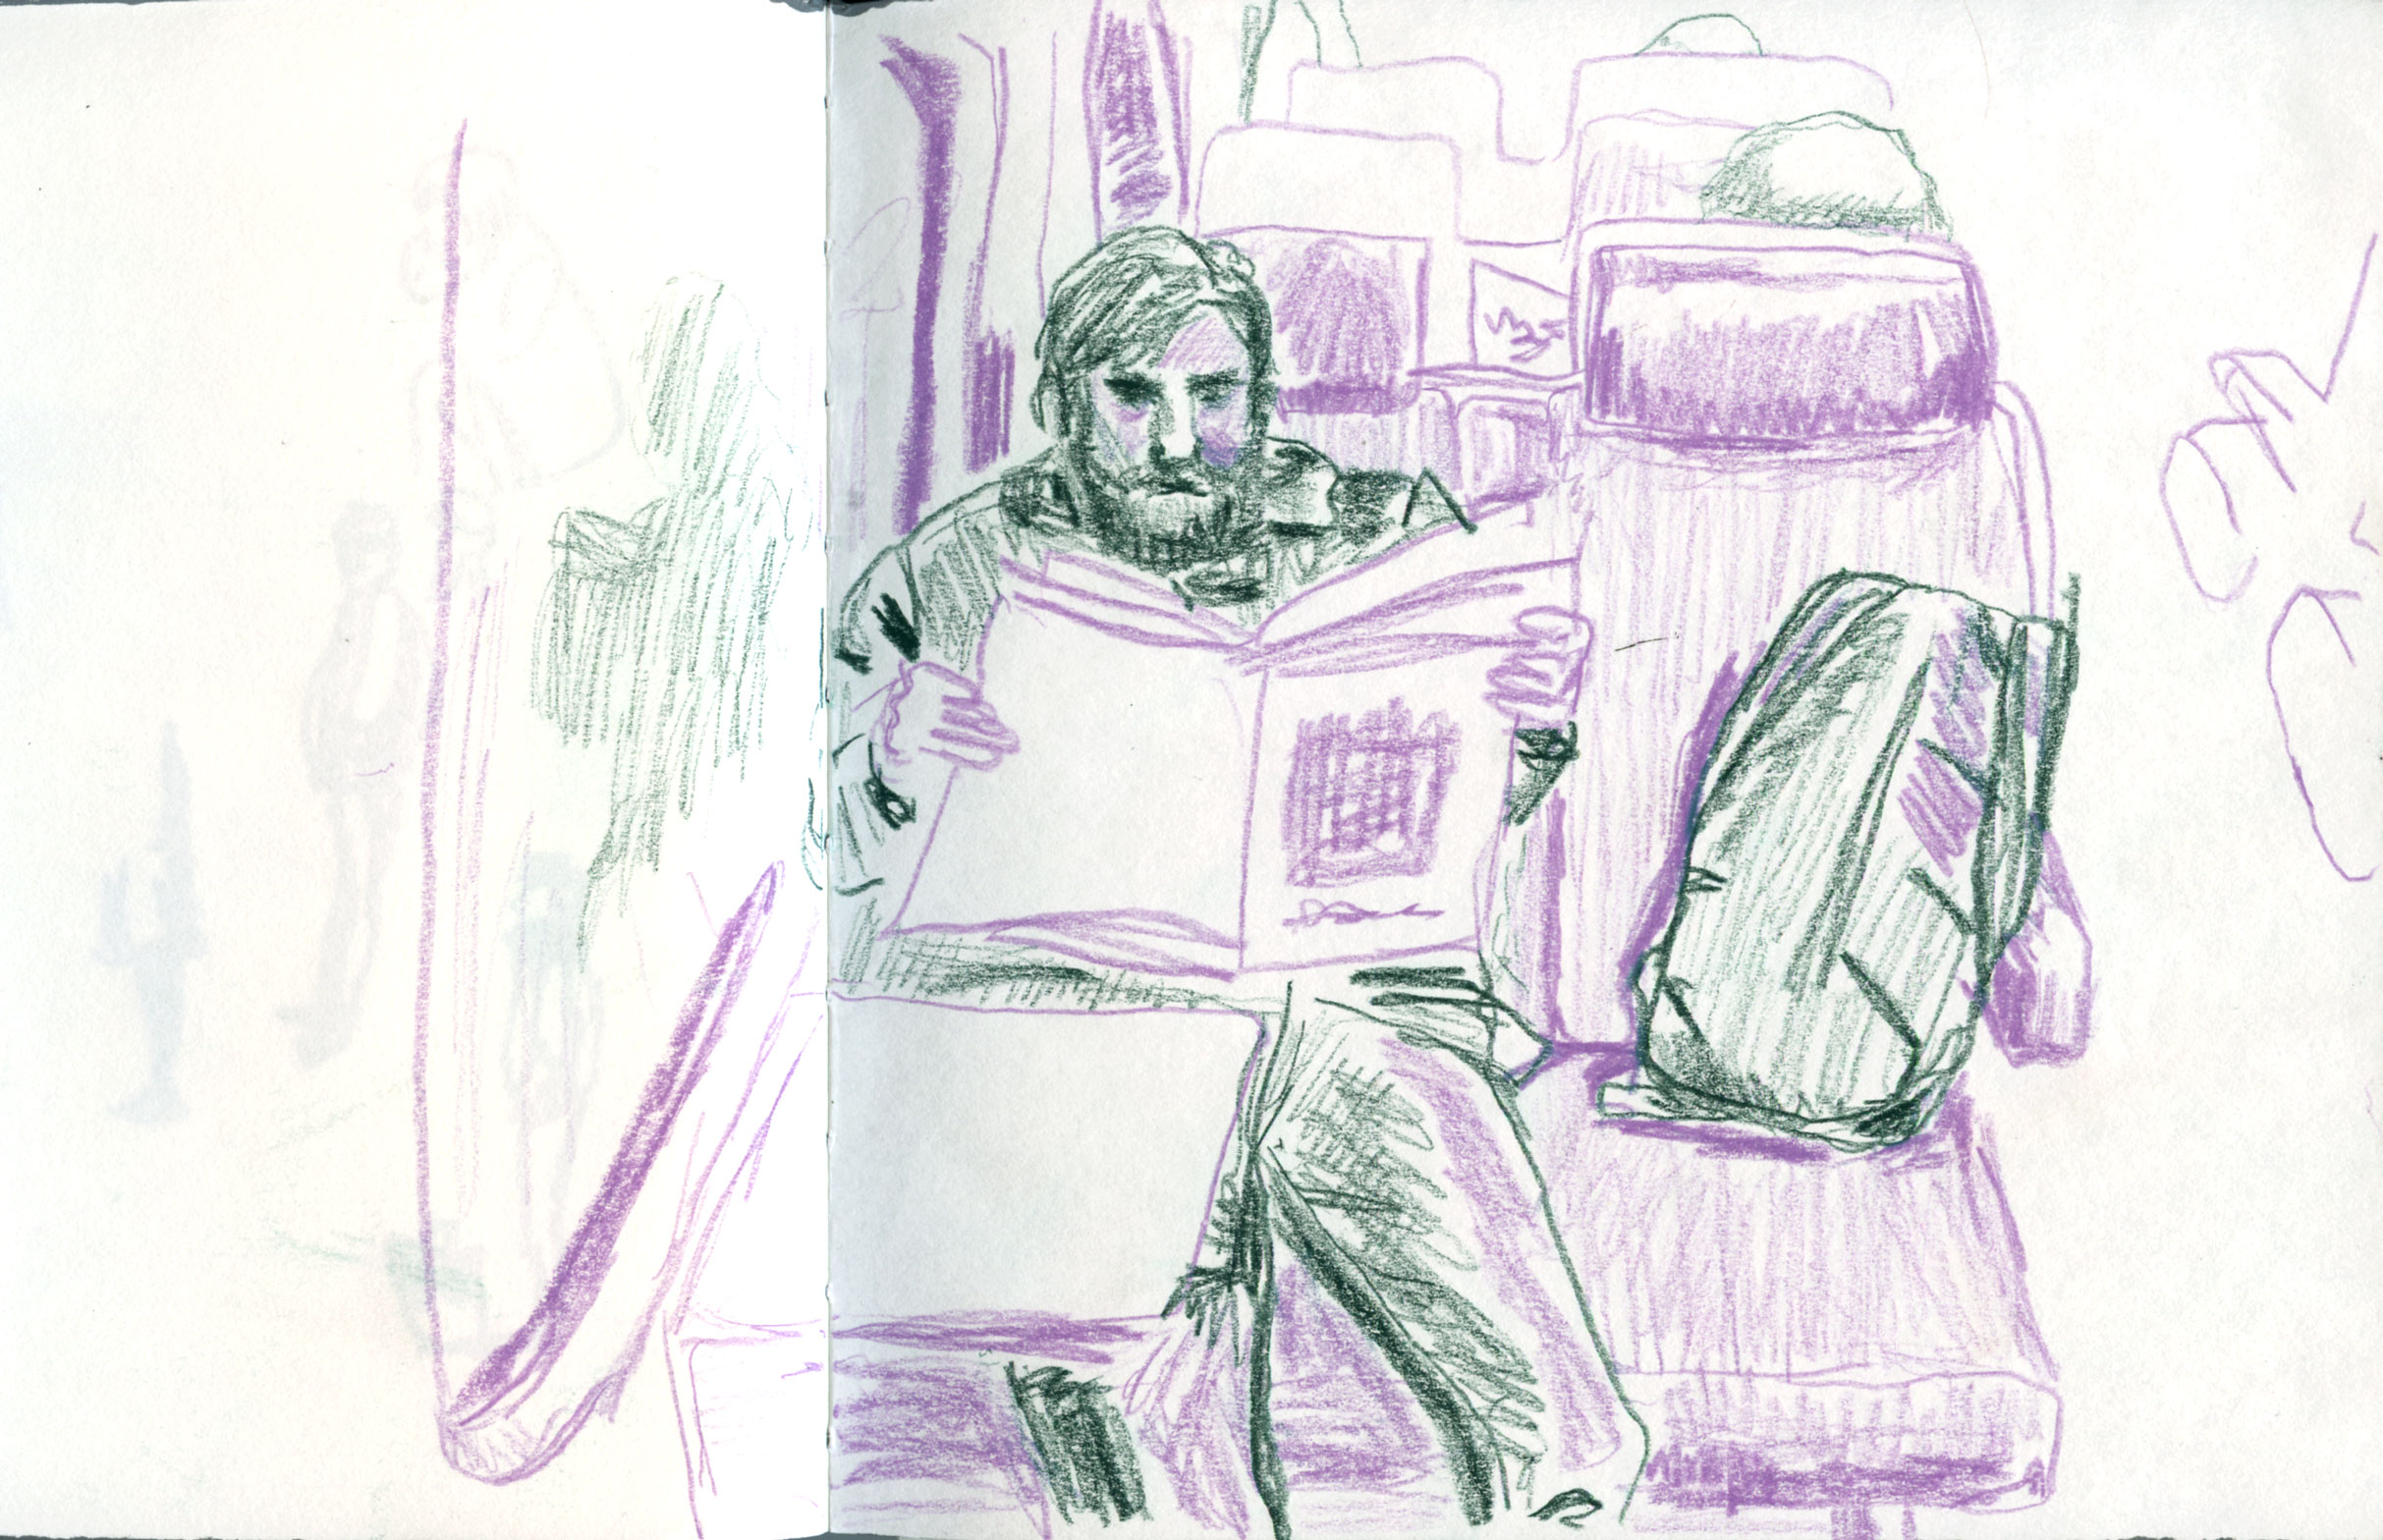 sketch man reading paper on train by ellen vesters ma childrens book illustration